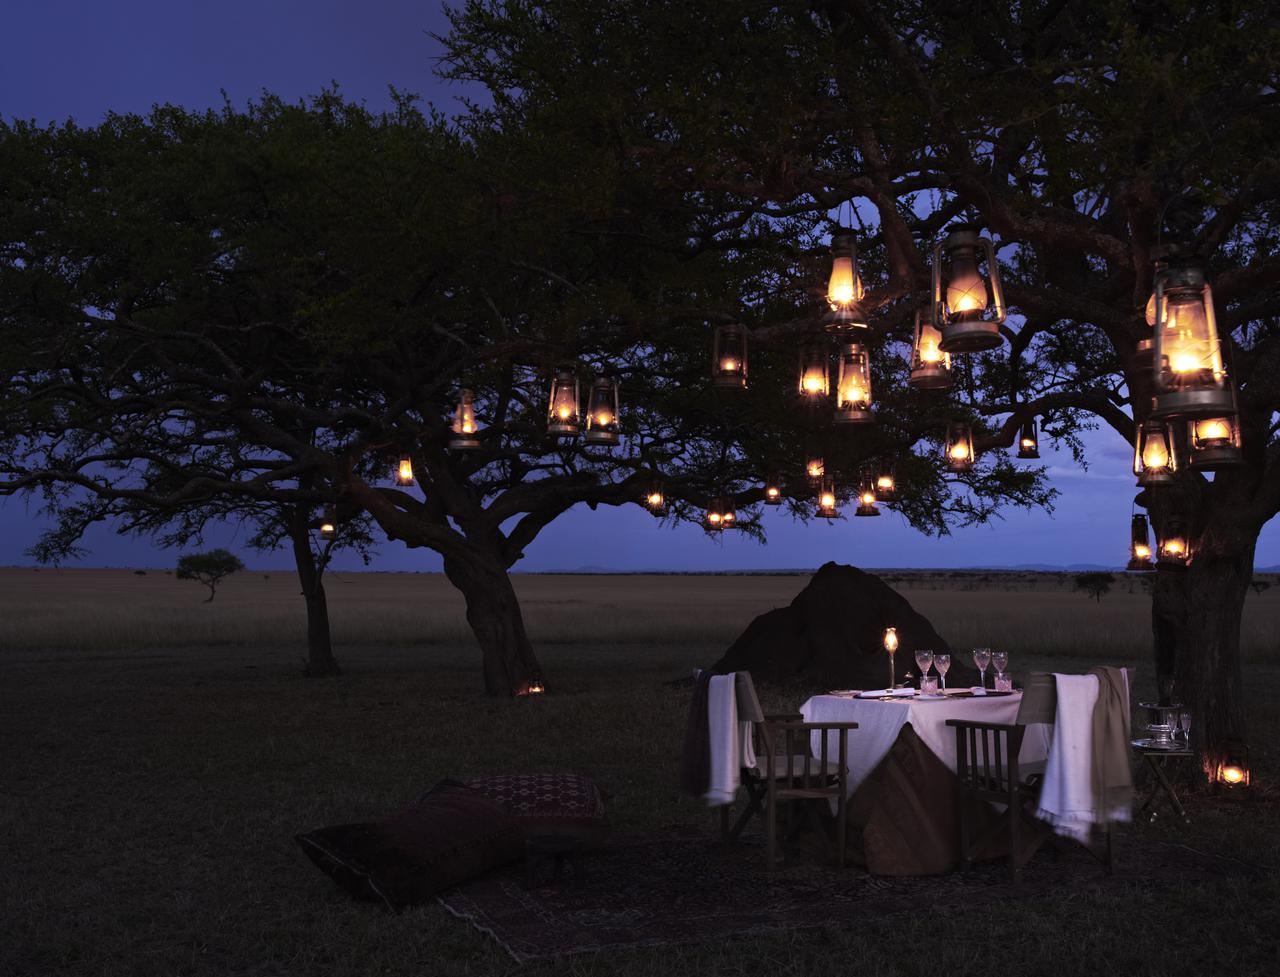 lanterns hung from the trees over a dinner table at Singita Sabora on luxury Tanzania safari